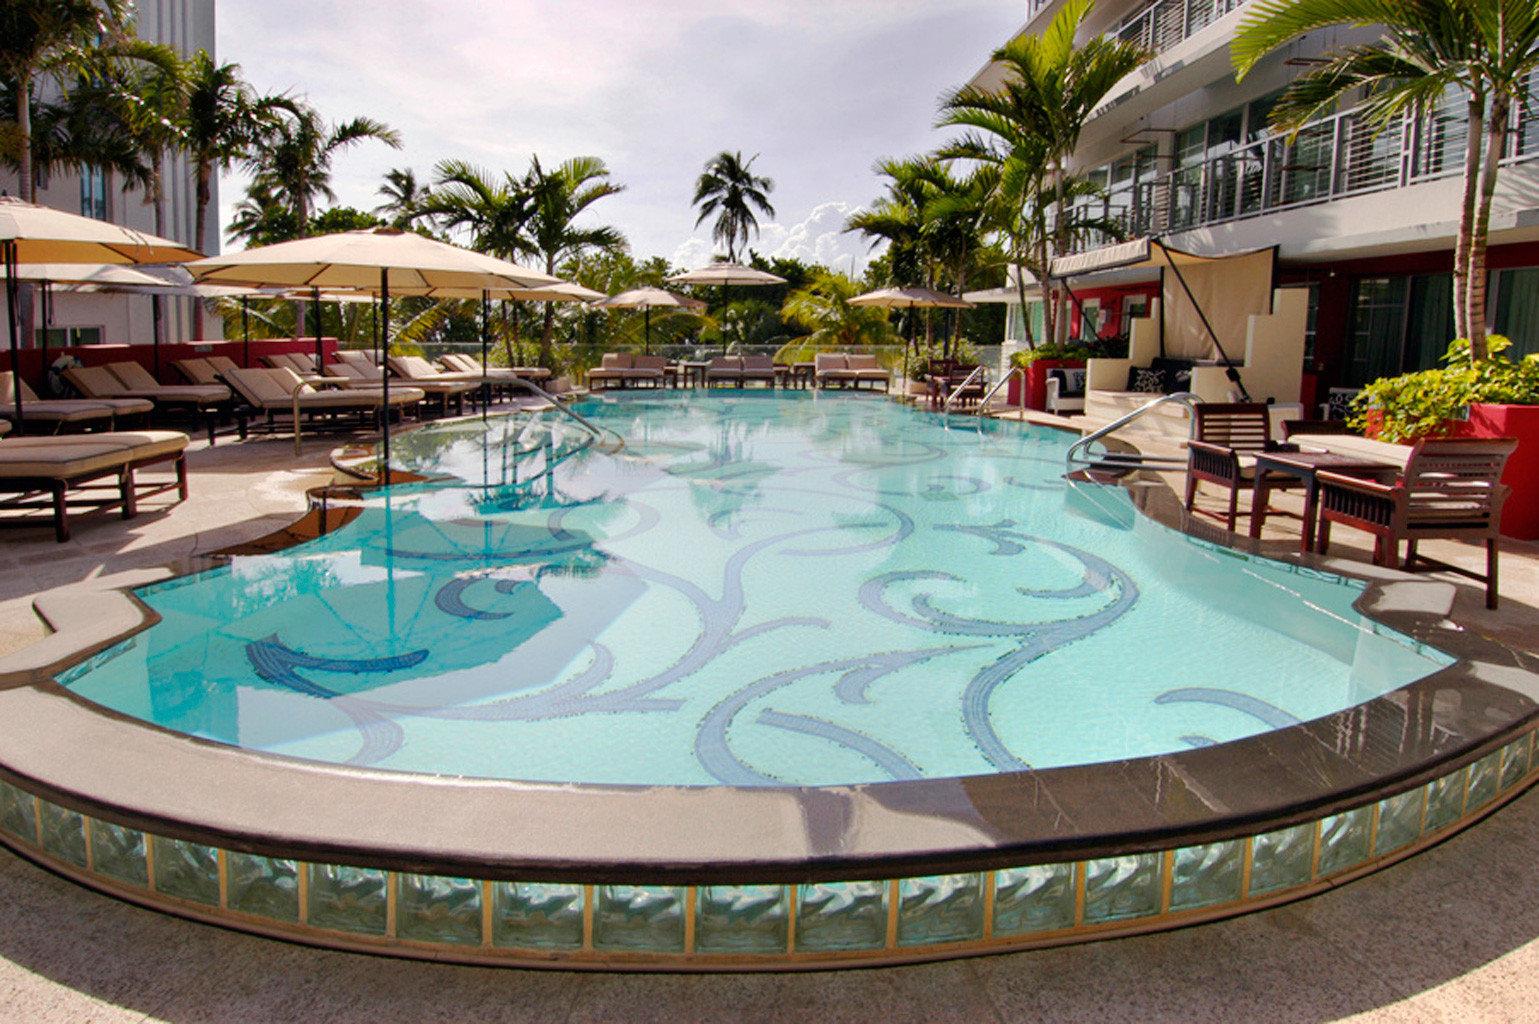 Hip Luxury Modern Pool swimming pool leisure property Resort resort town backyard condominium Villa mansion Water park